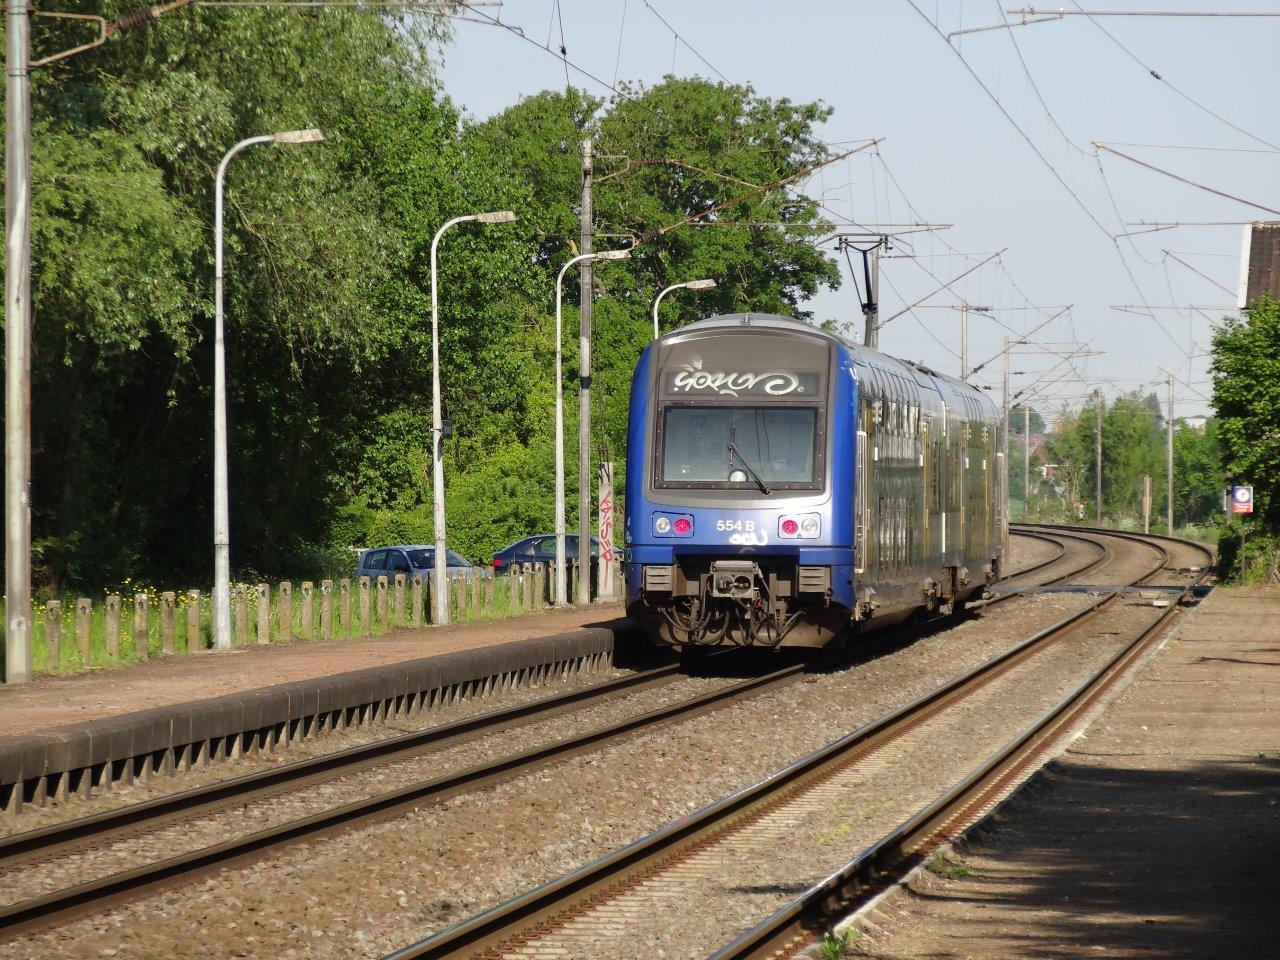 gare-de-beuvrages-train-station